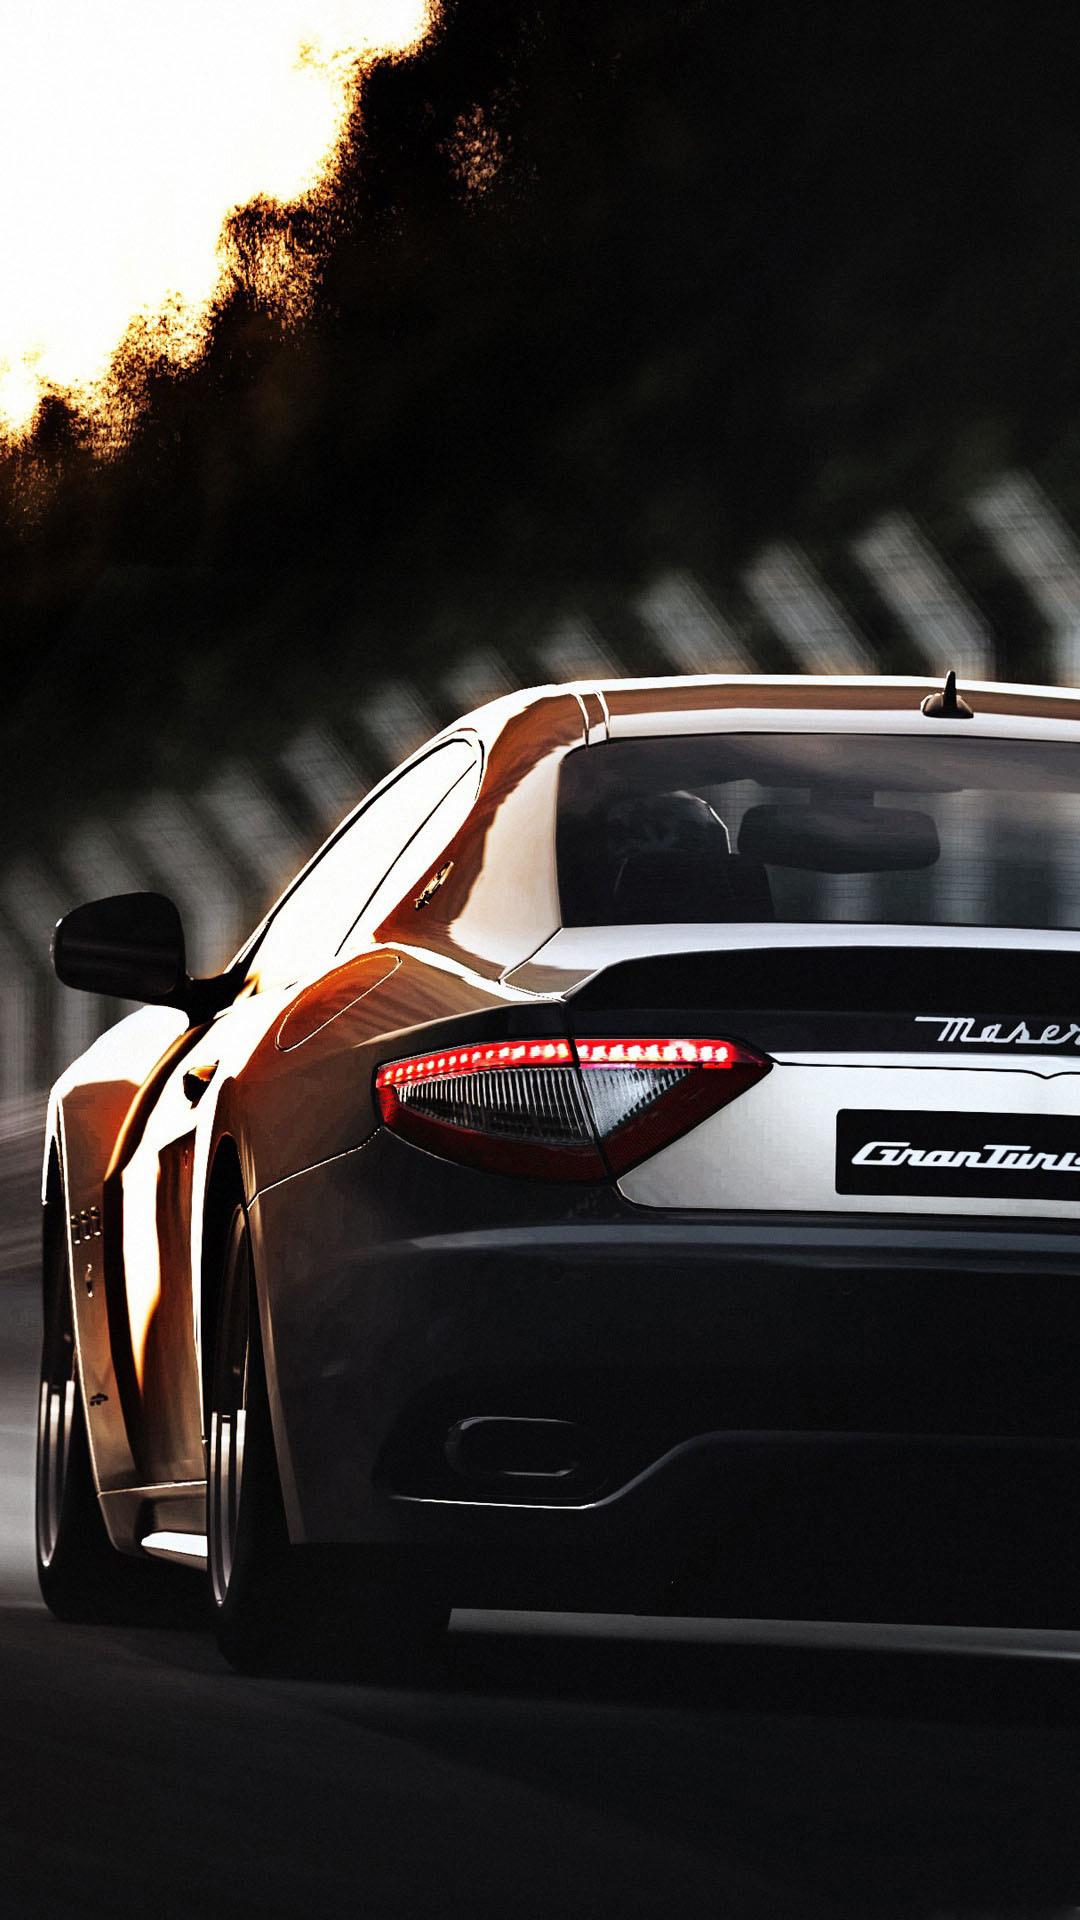 Audi R8 Wallpaper Iphone 6 Maserati Granturismo Best Htc One Wallpapers